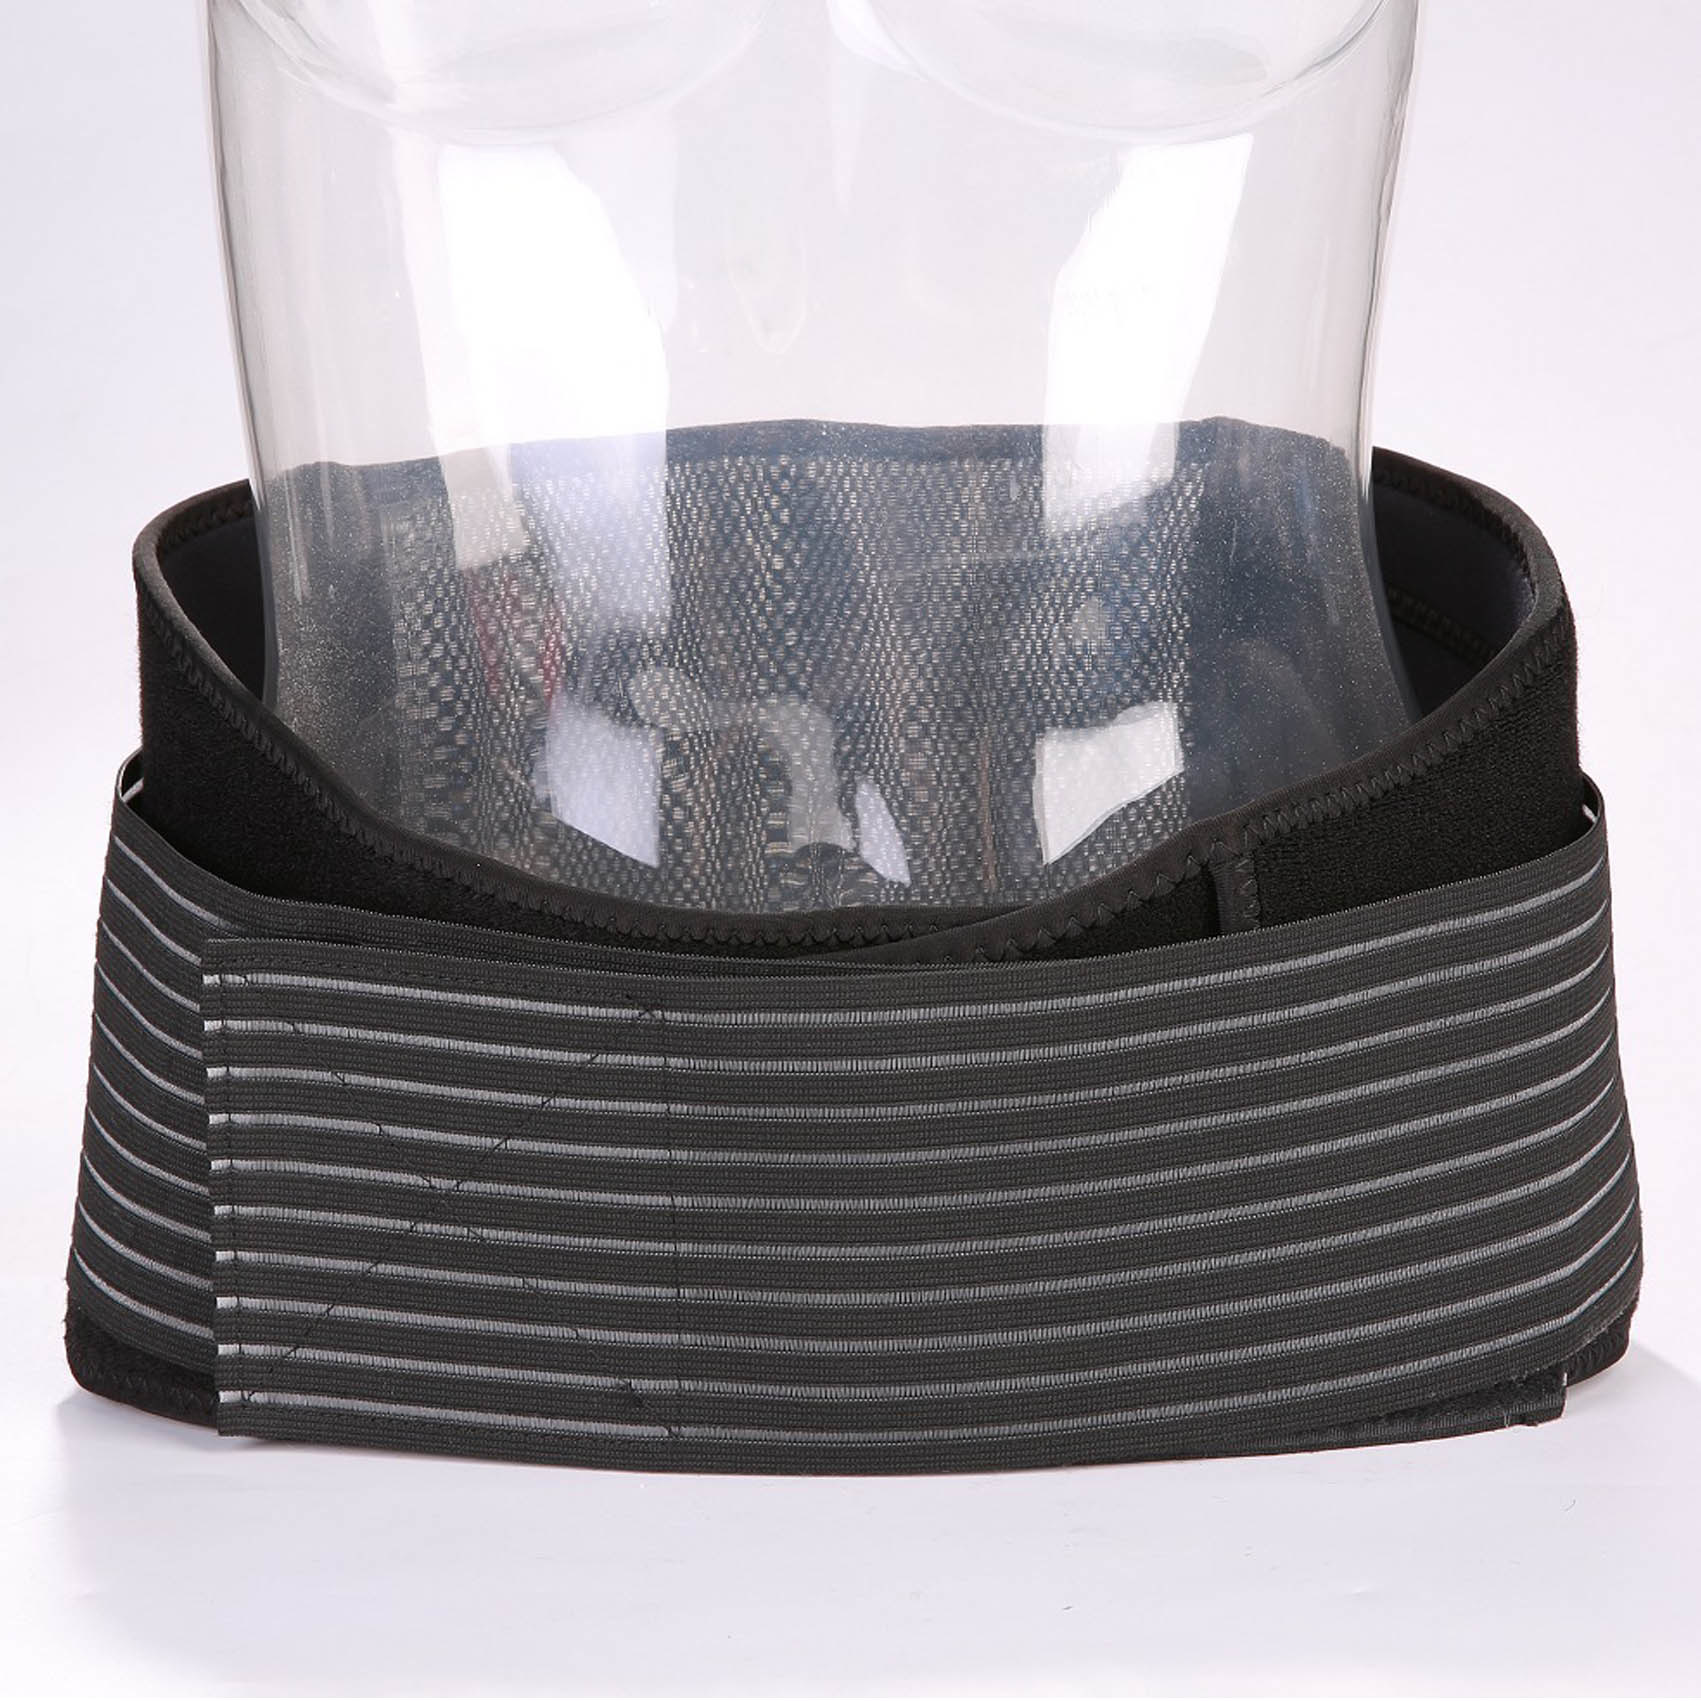 Graphene Far Infrared Heating Waist Support